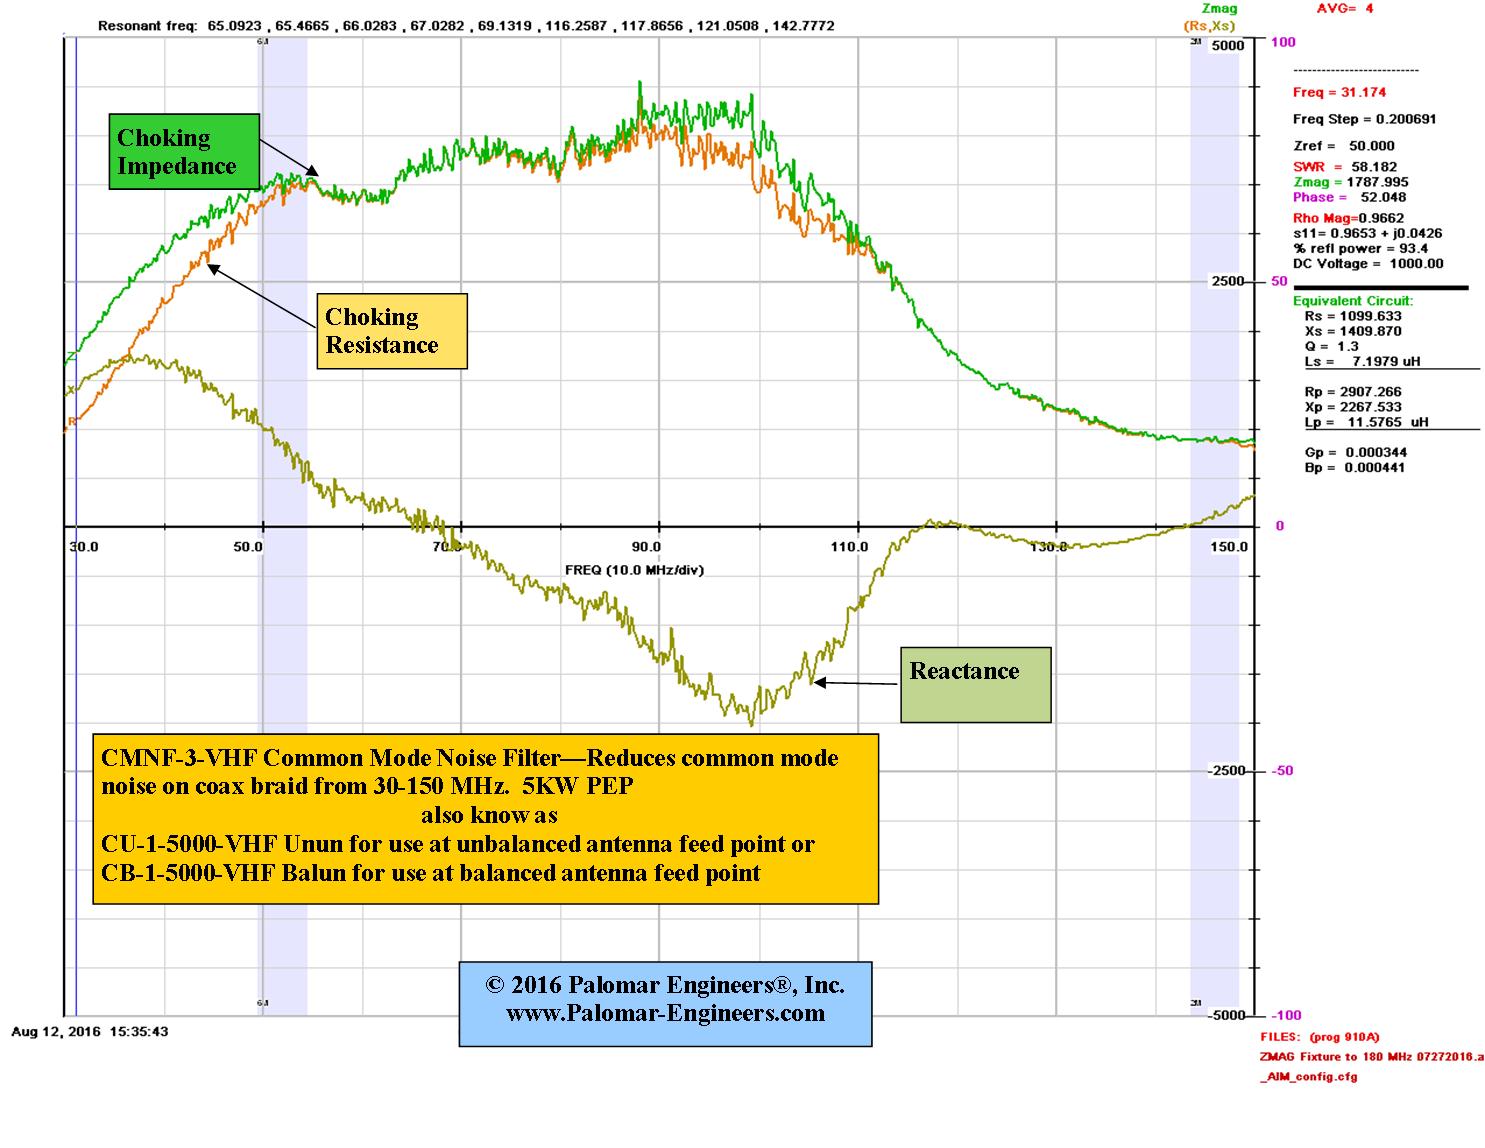 cmnf-3-vhf graph